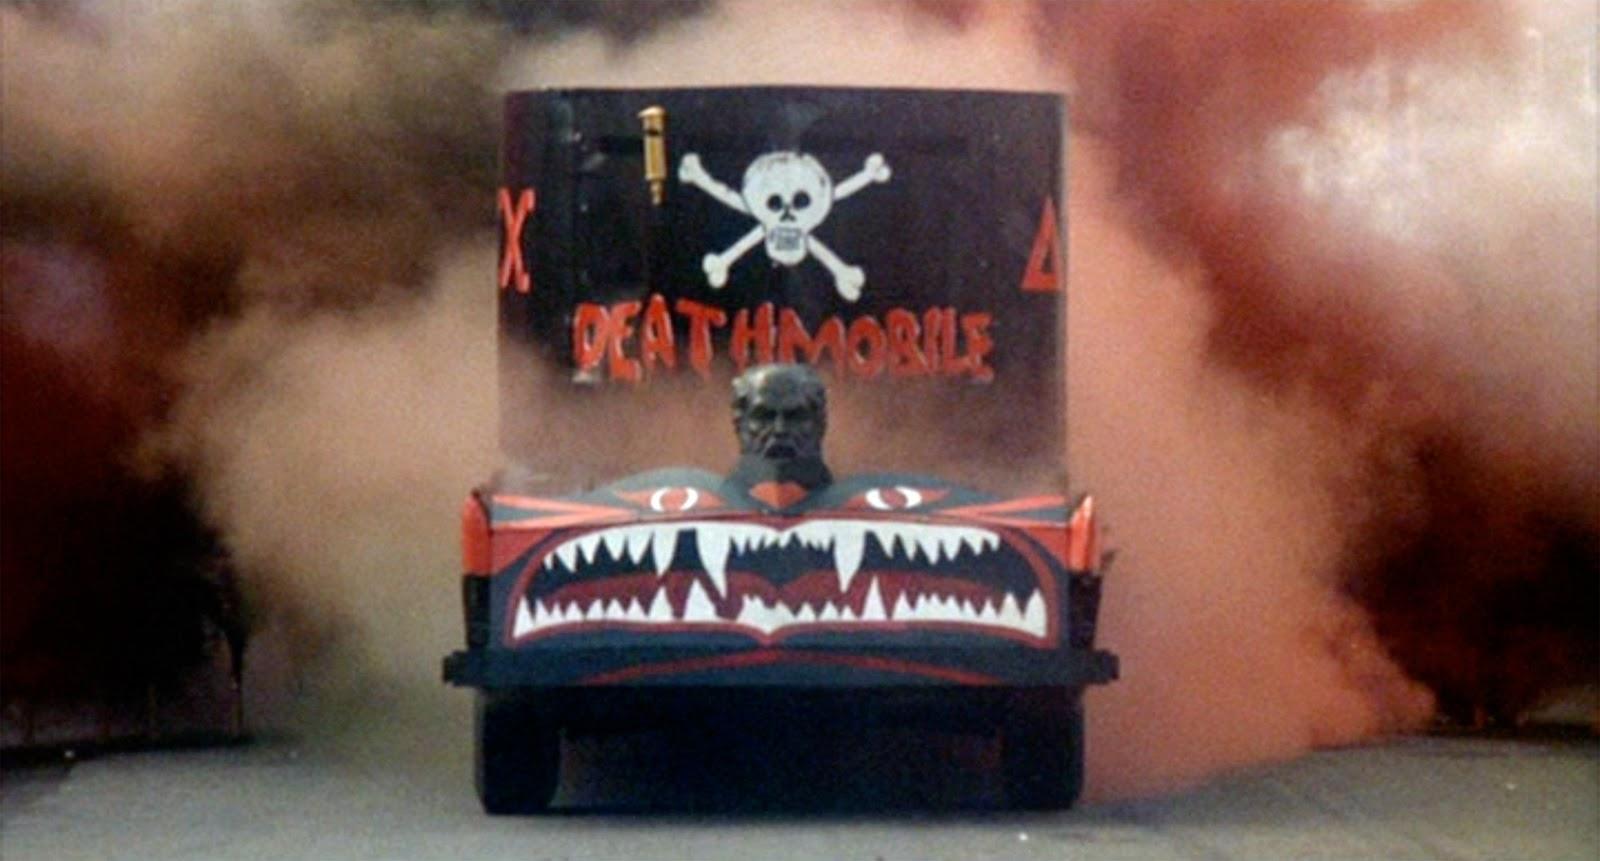 The deathmobile from Animal House